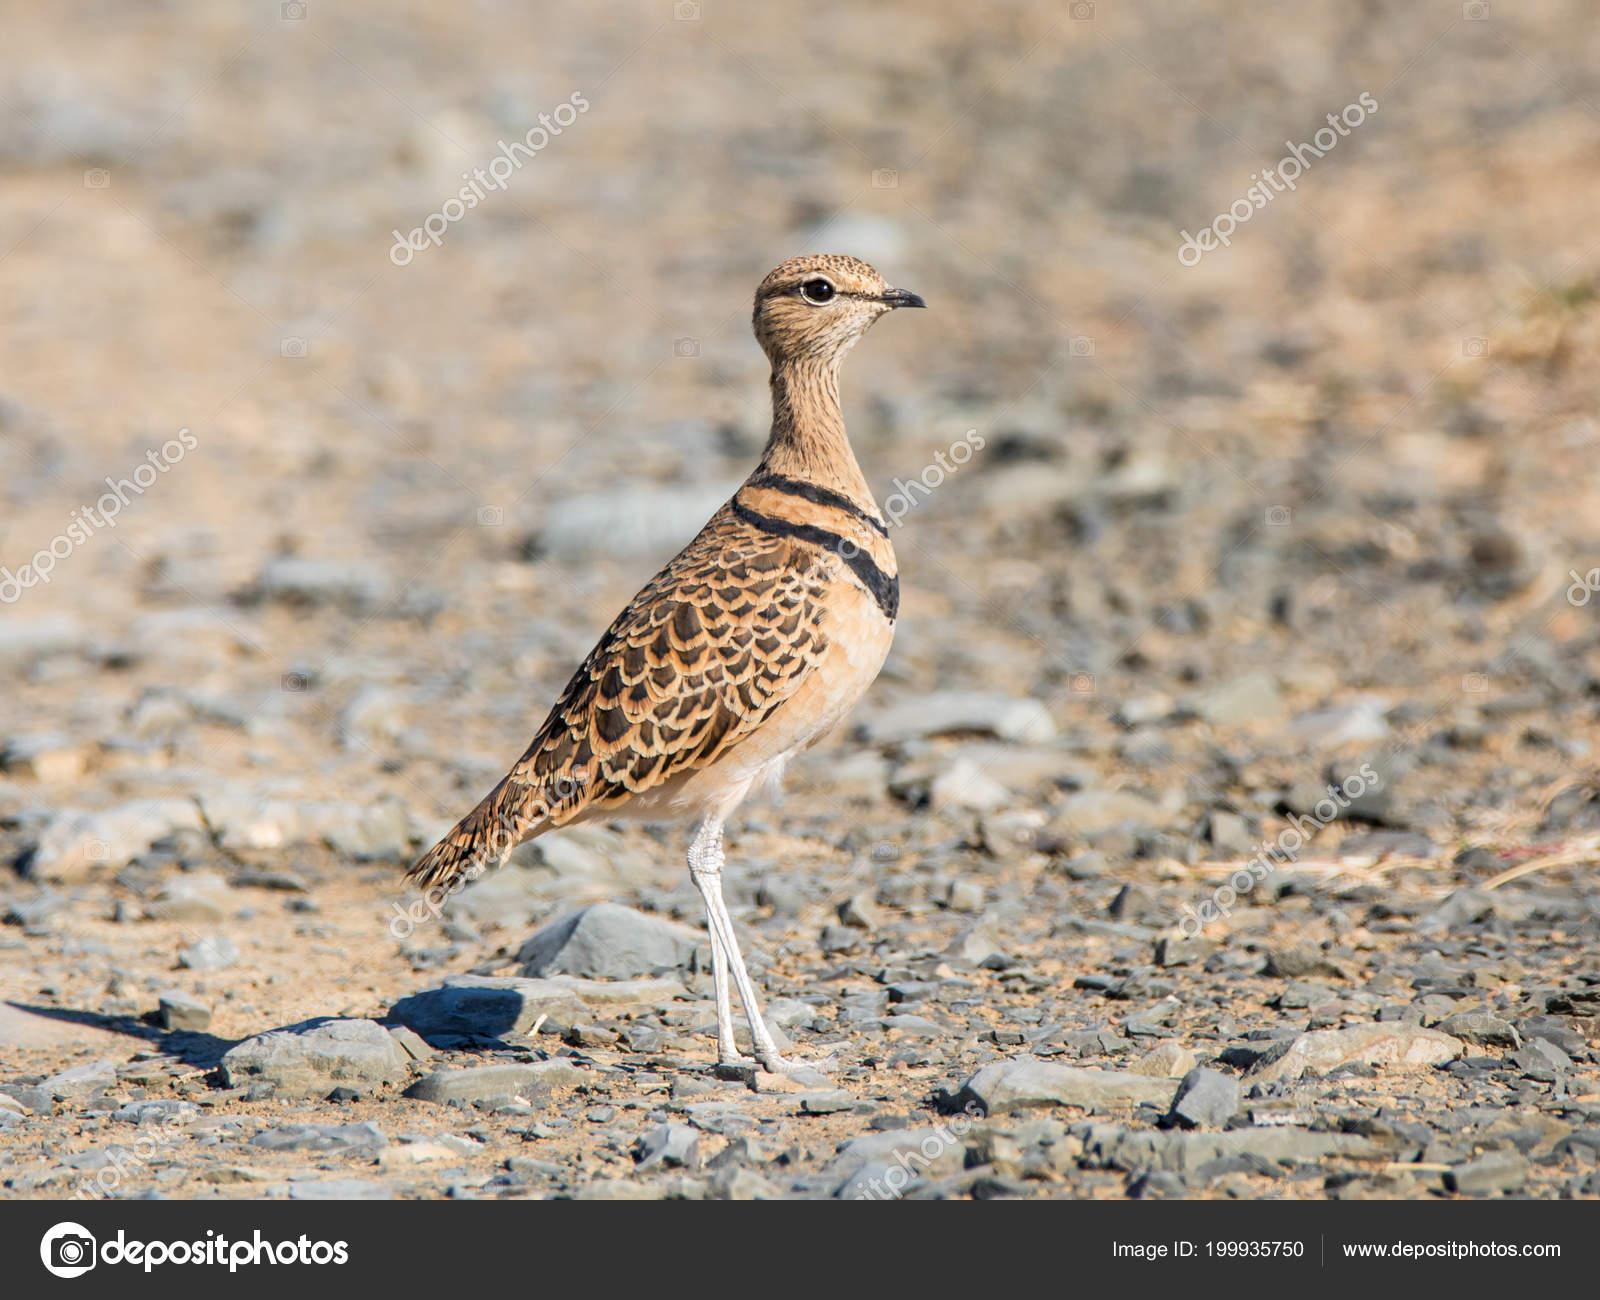 Exquisite Little Bird Common Resident Local Nomad Semi Arid Desert Stock Photo C Binty 199935750